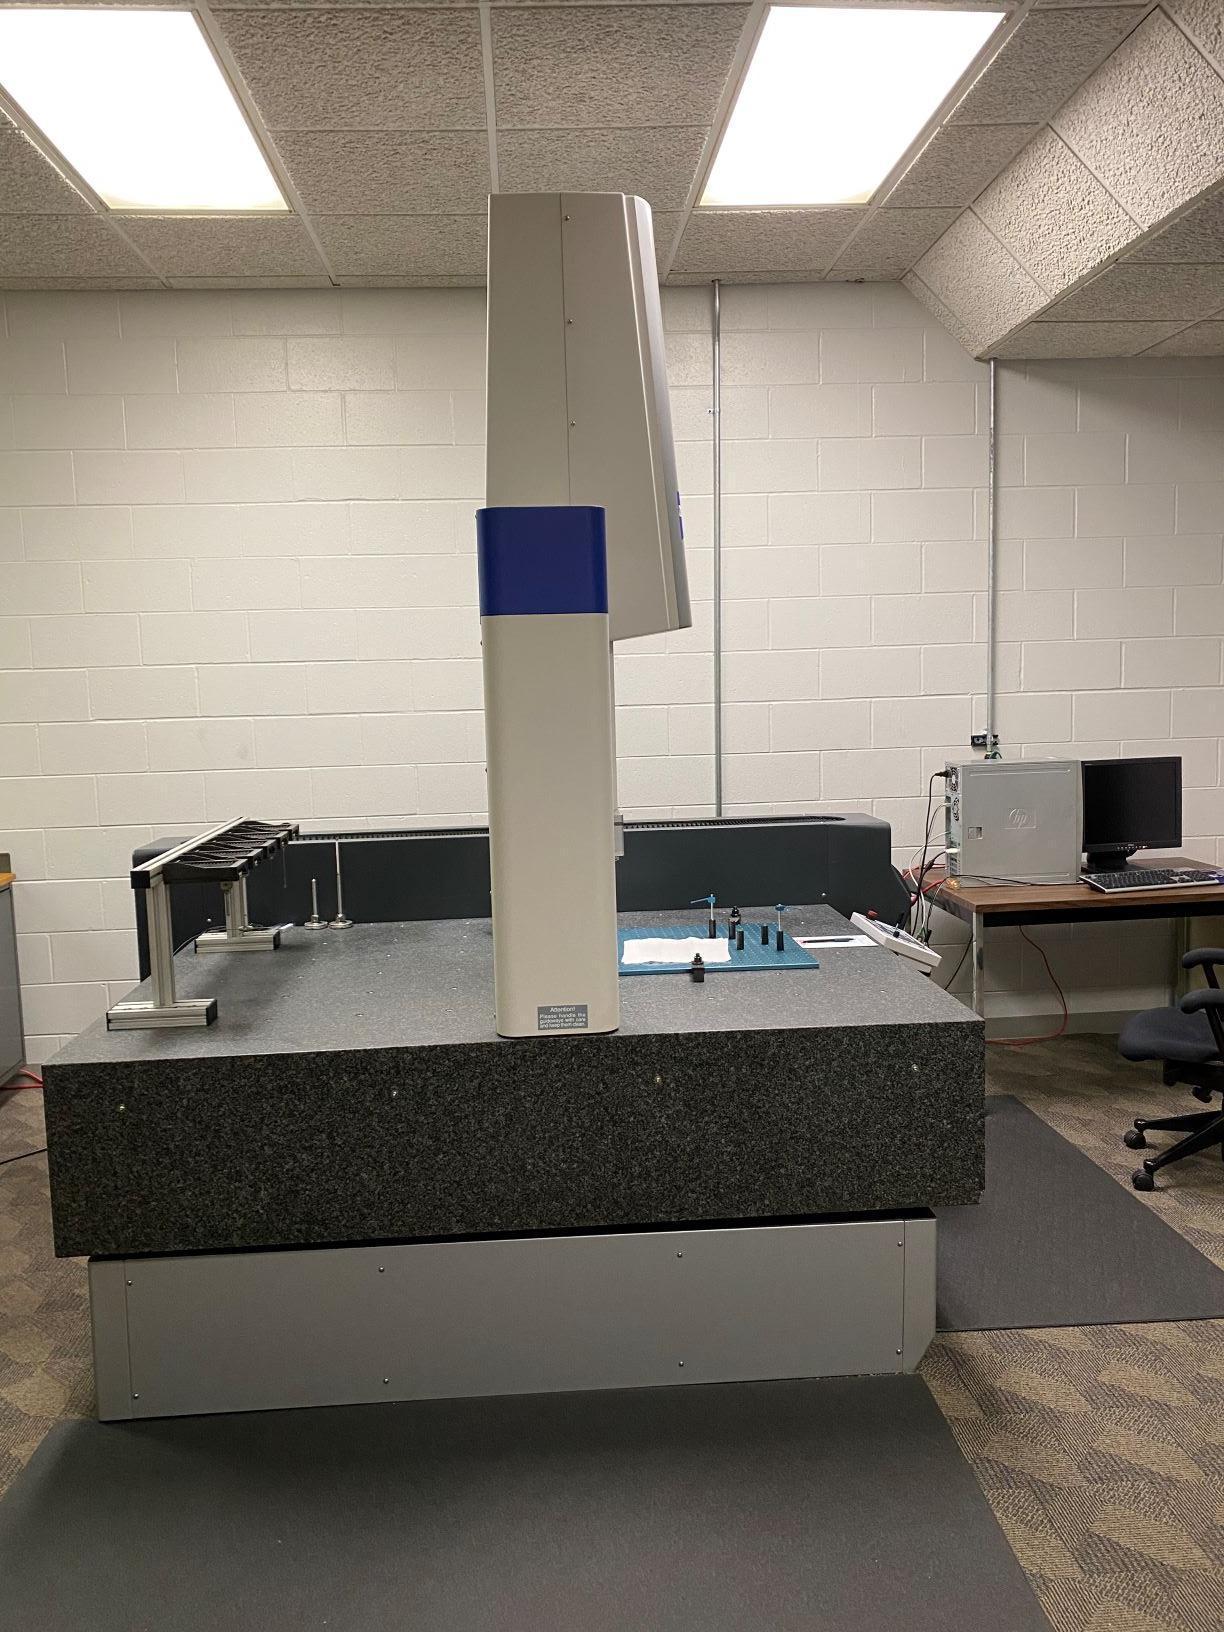 ZEISSZeiss Contura 10/16/6 Coordinate Measuring Machine (CMM) (#33214)